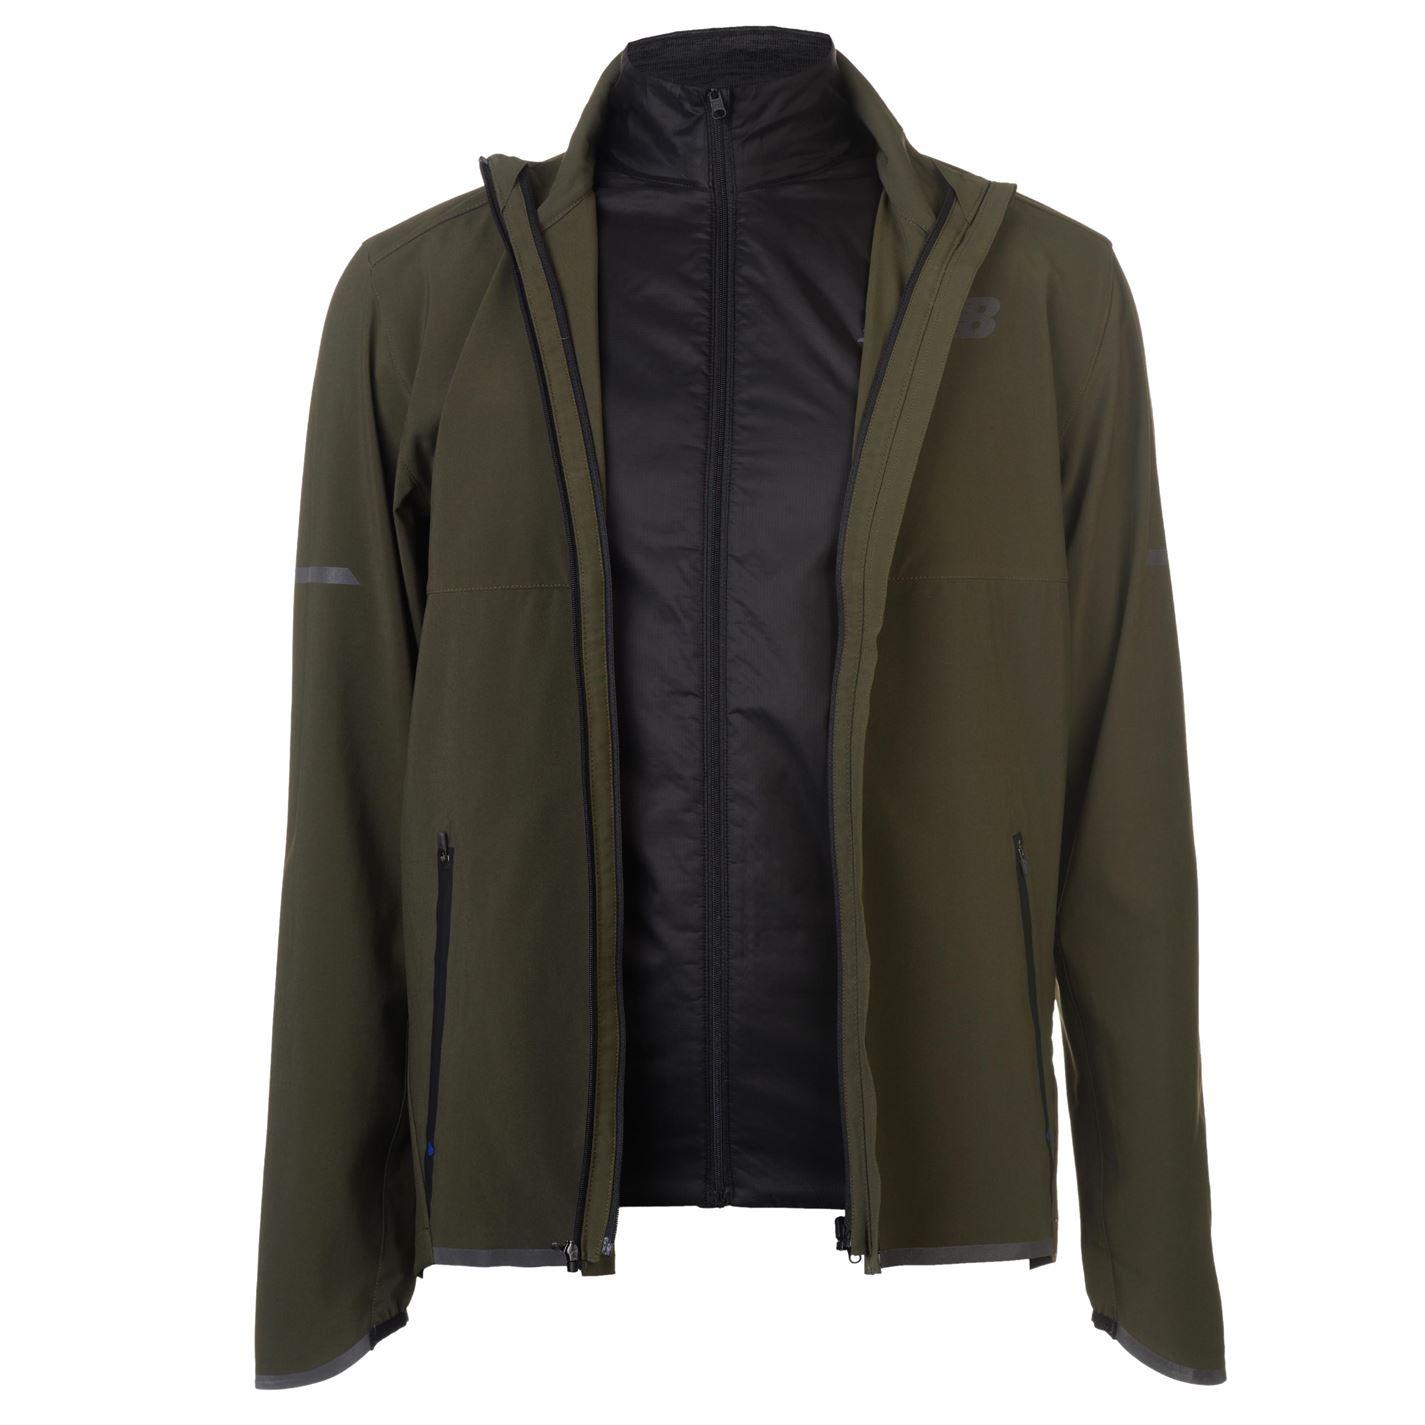 b0f8960922 Dzseki New Balance Precision Jacket Mens - Glami.hu